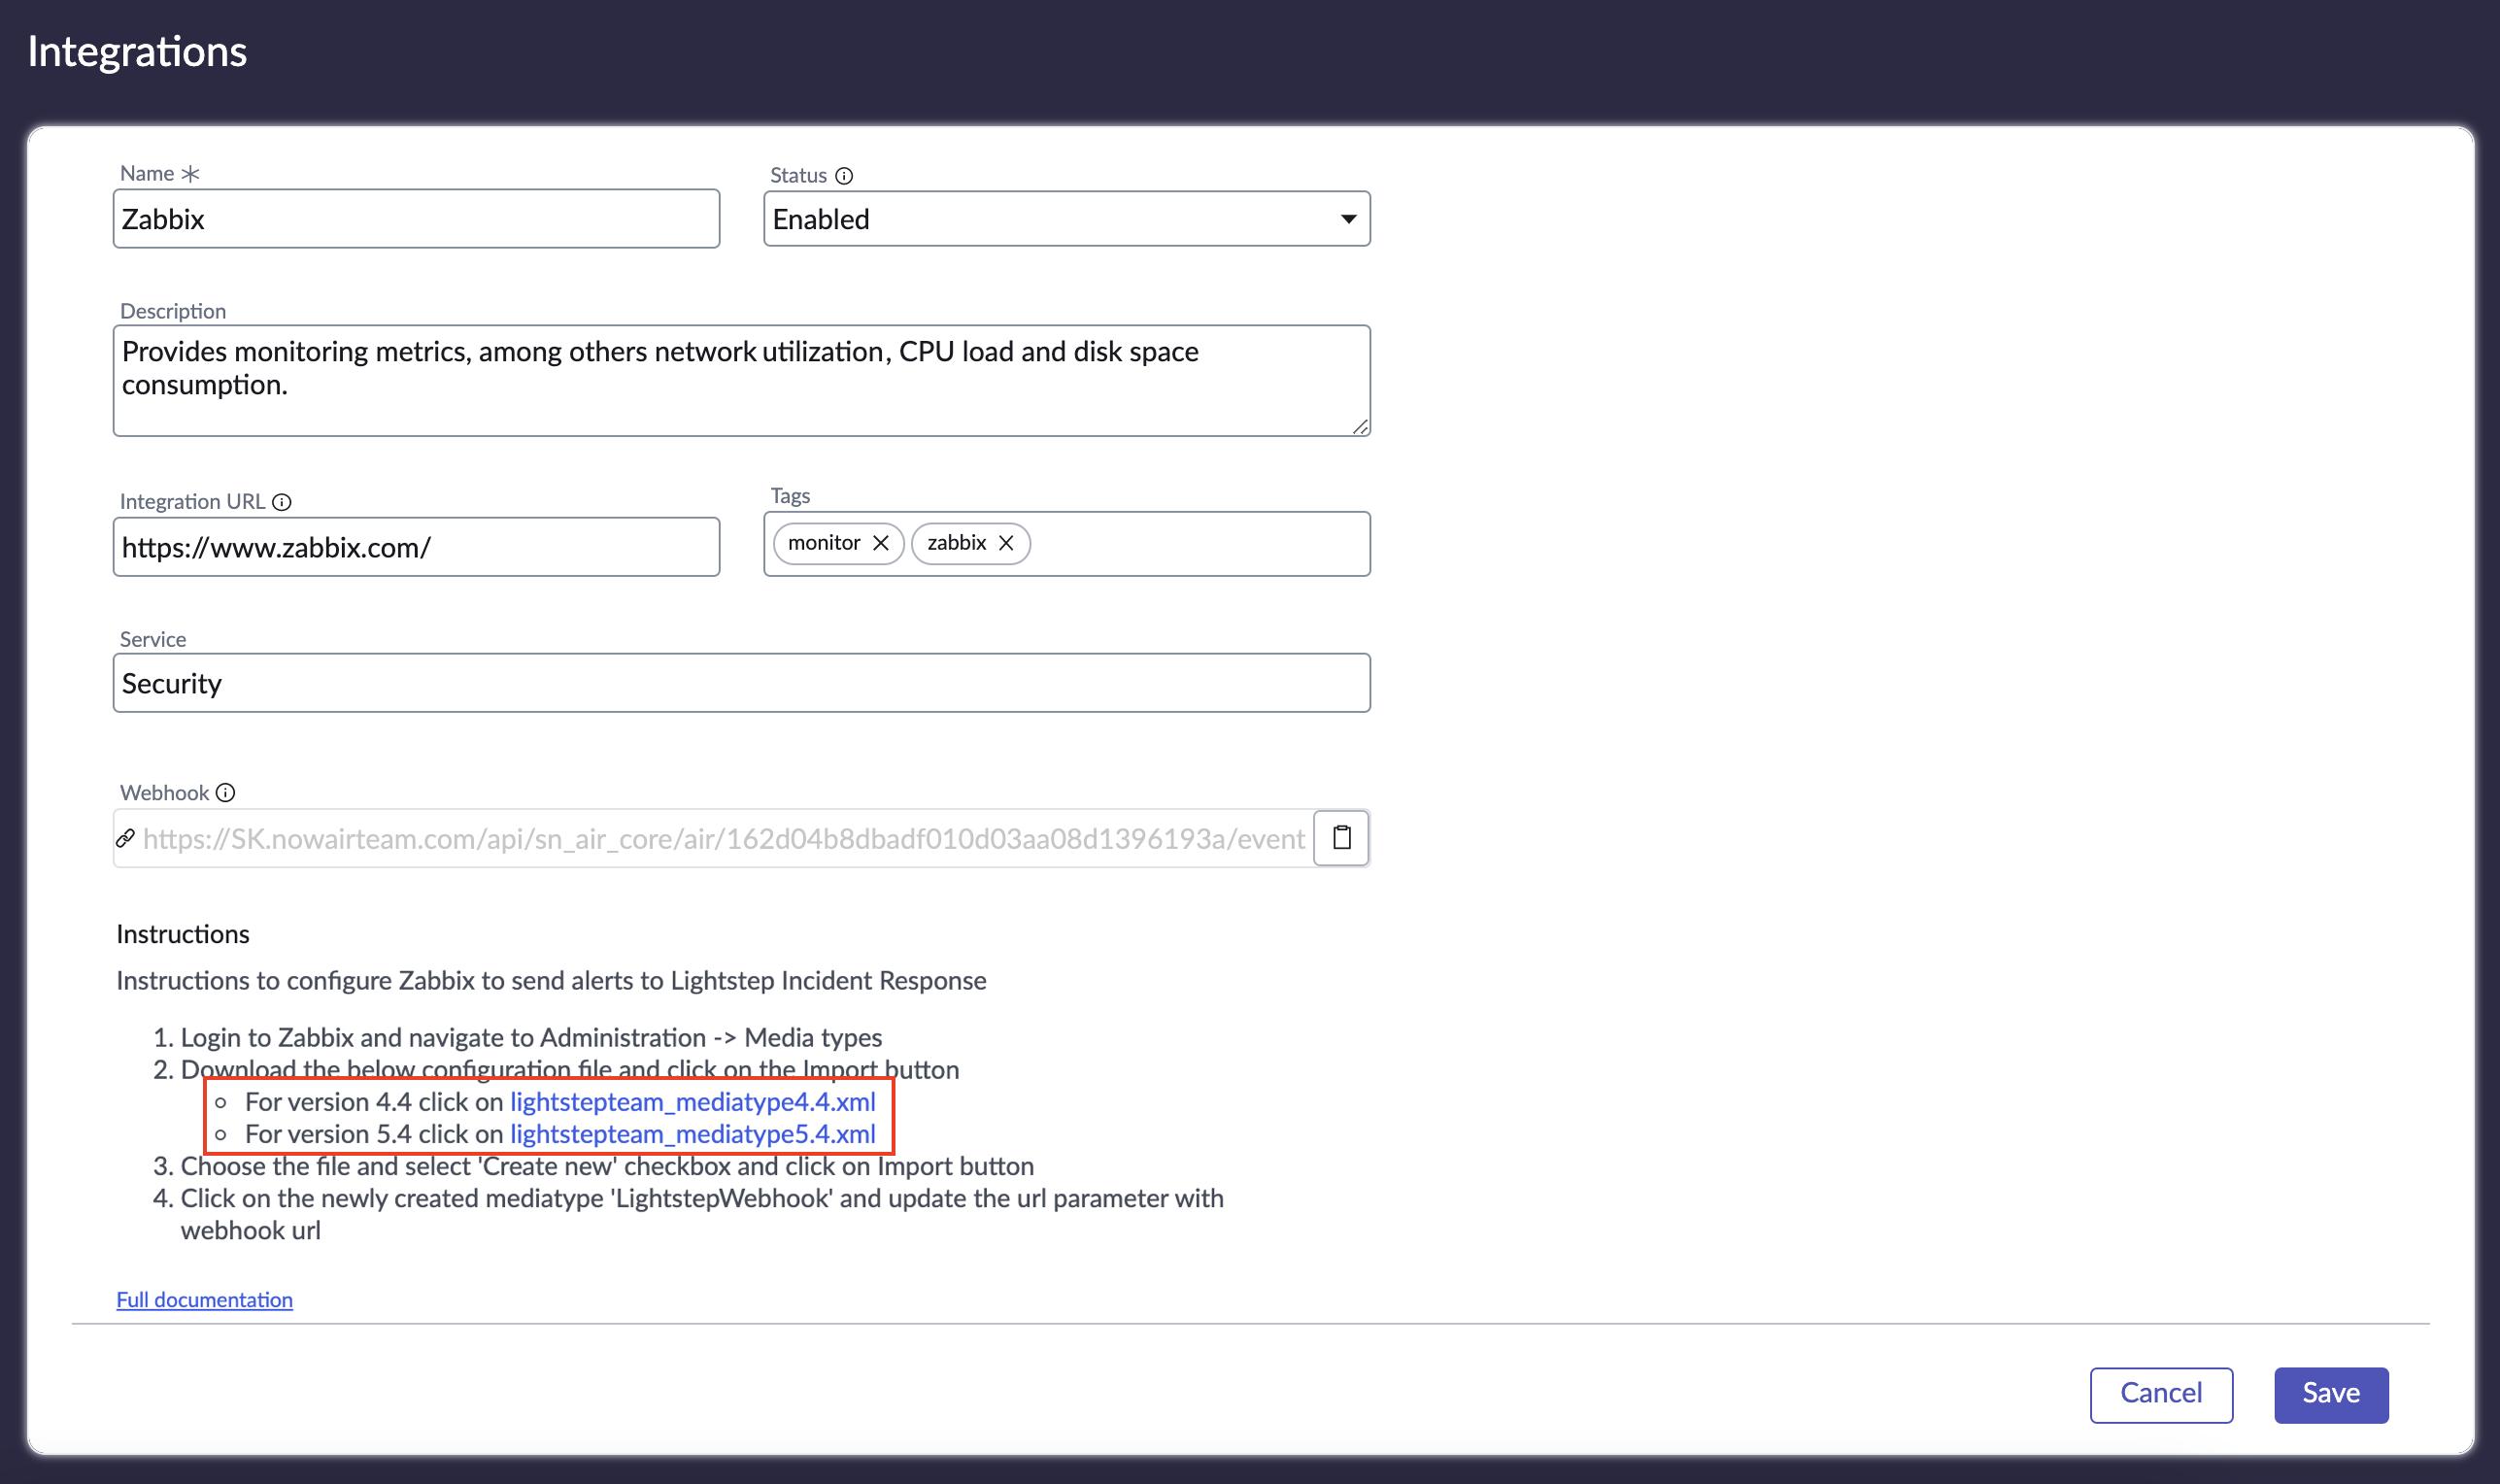 Links for Zabbix configuration files.